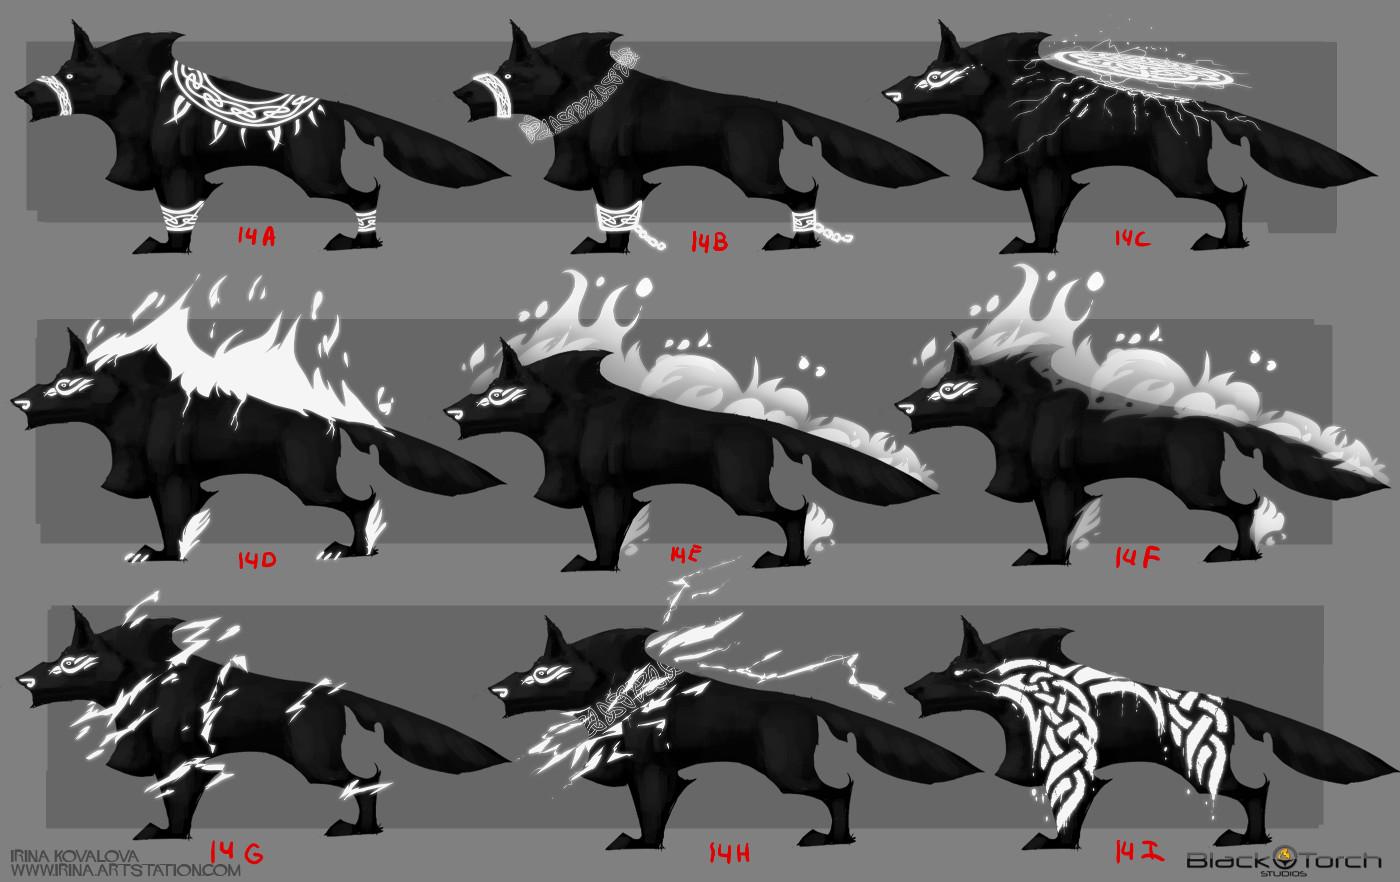 Irina kovalova bts wolf conceptart ikovalova 6